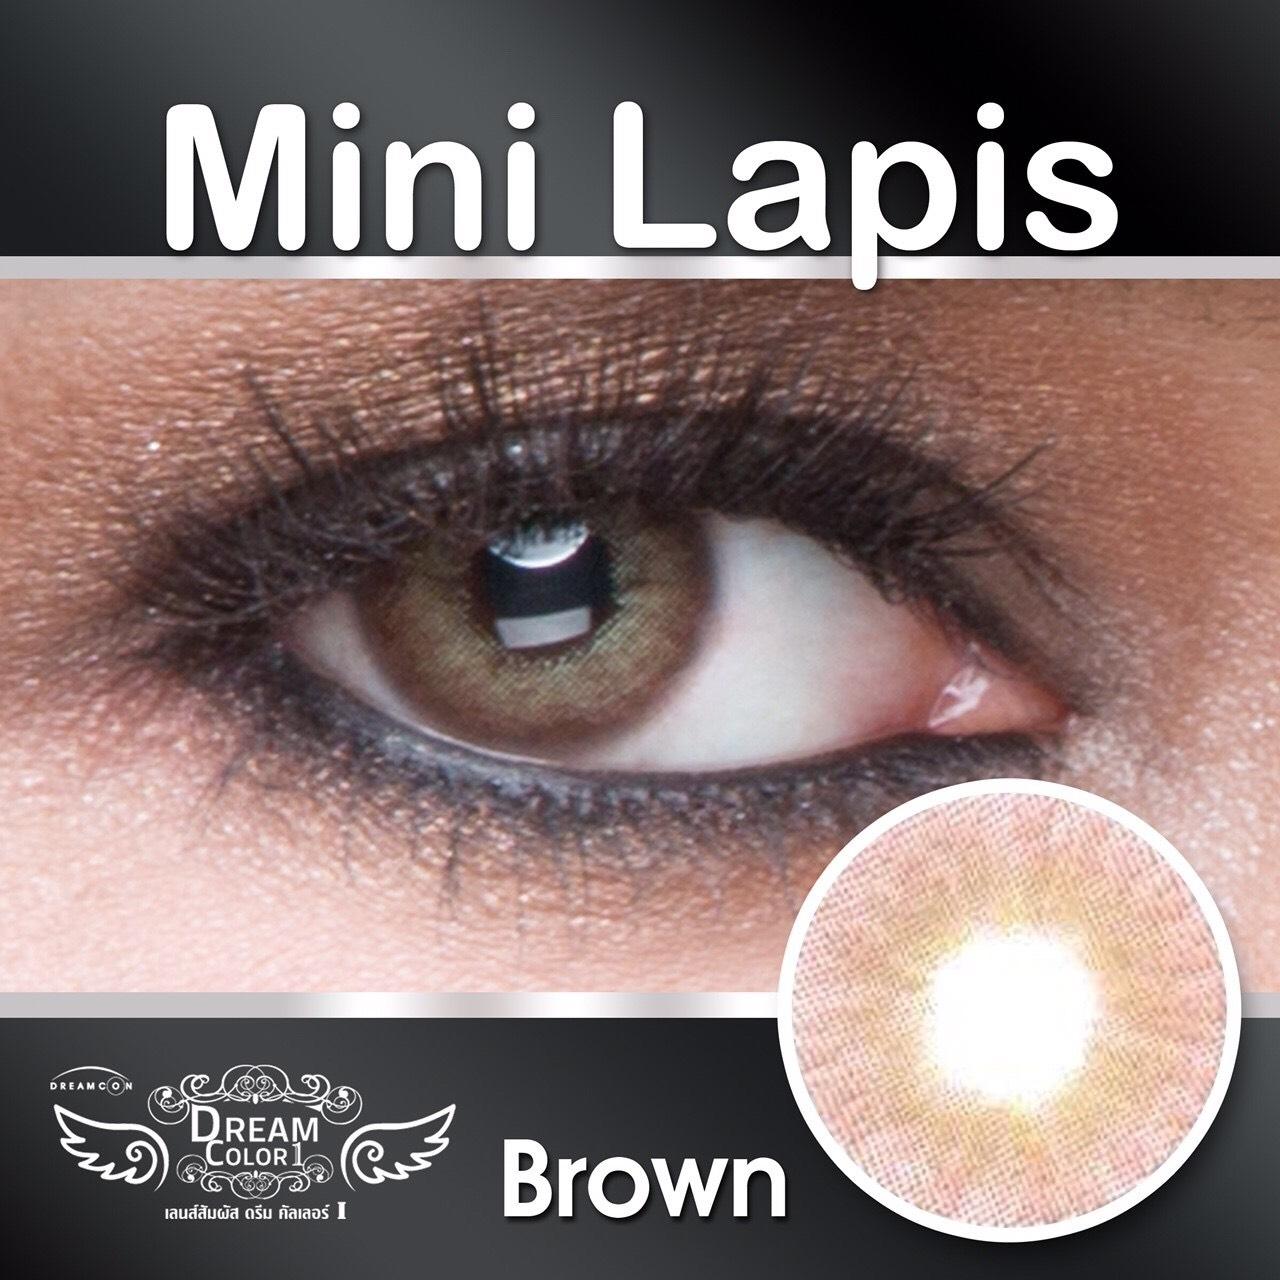 Mini Lapis Dreamcolor1 เลนส์ไซร์มินิ ตาฝรั่ง